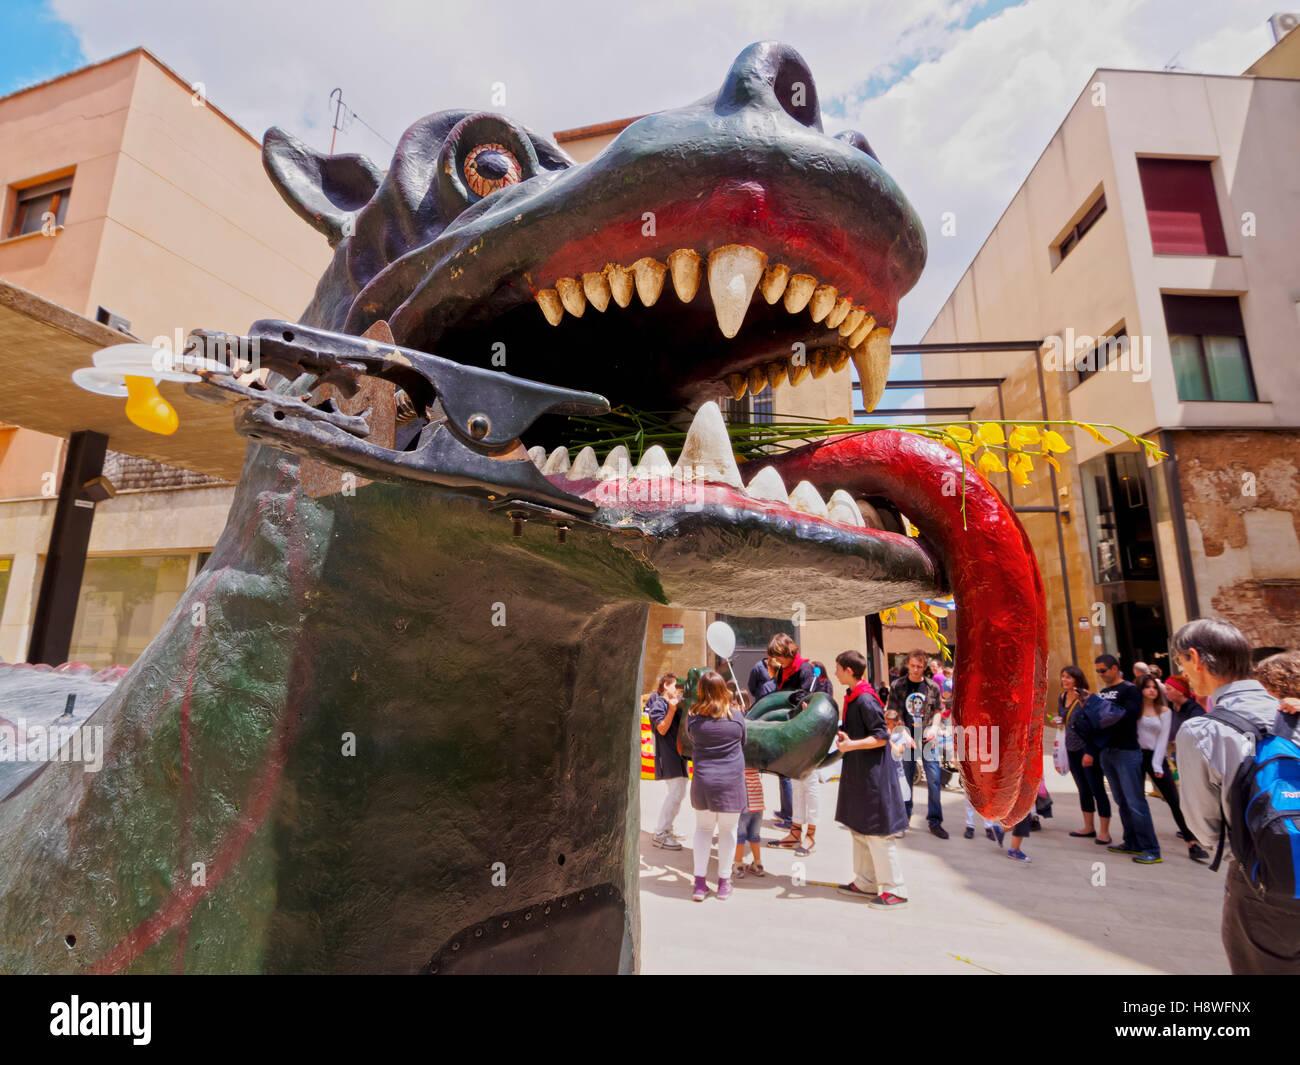 Spain, Catalonia, Barcelona Province, Terrassa, View of the Dragon. - Stock Image